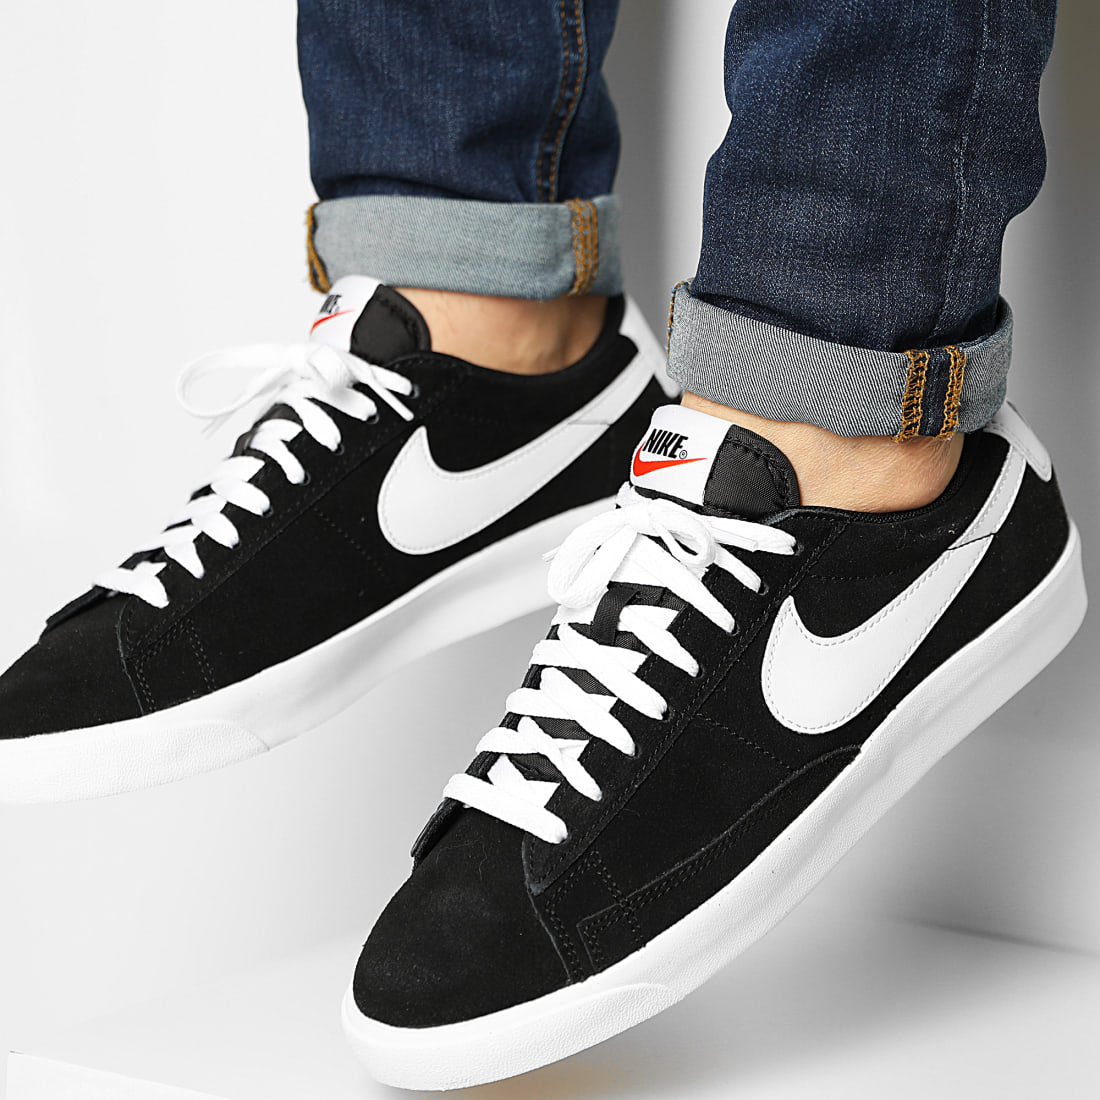 Nike - Baskets Blazer Low Premium Vintage Suede 538402 Black White ...